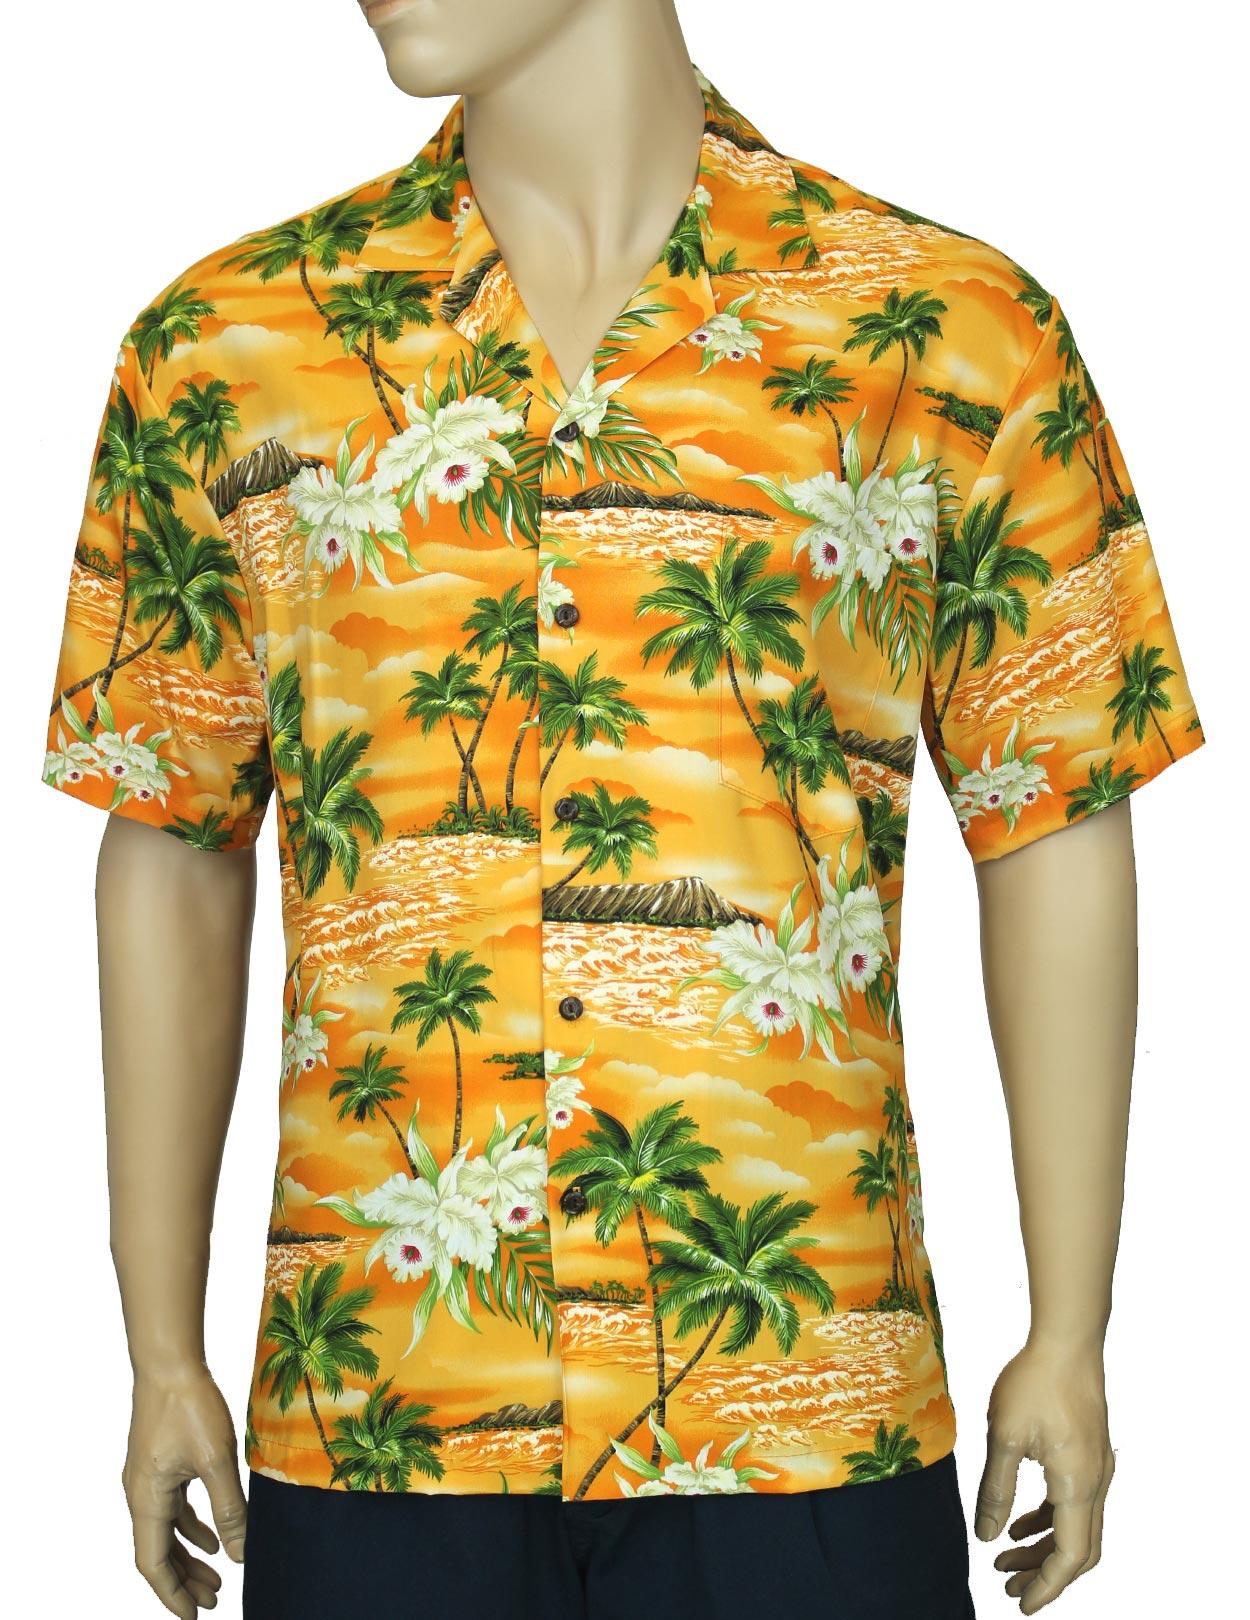 530907a8 Rayon Aloha Diamond Head Hawaiian Shirt: Shaka Time Hawaii Clothing Store